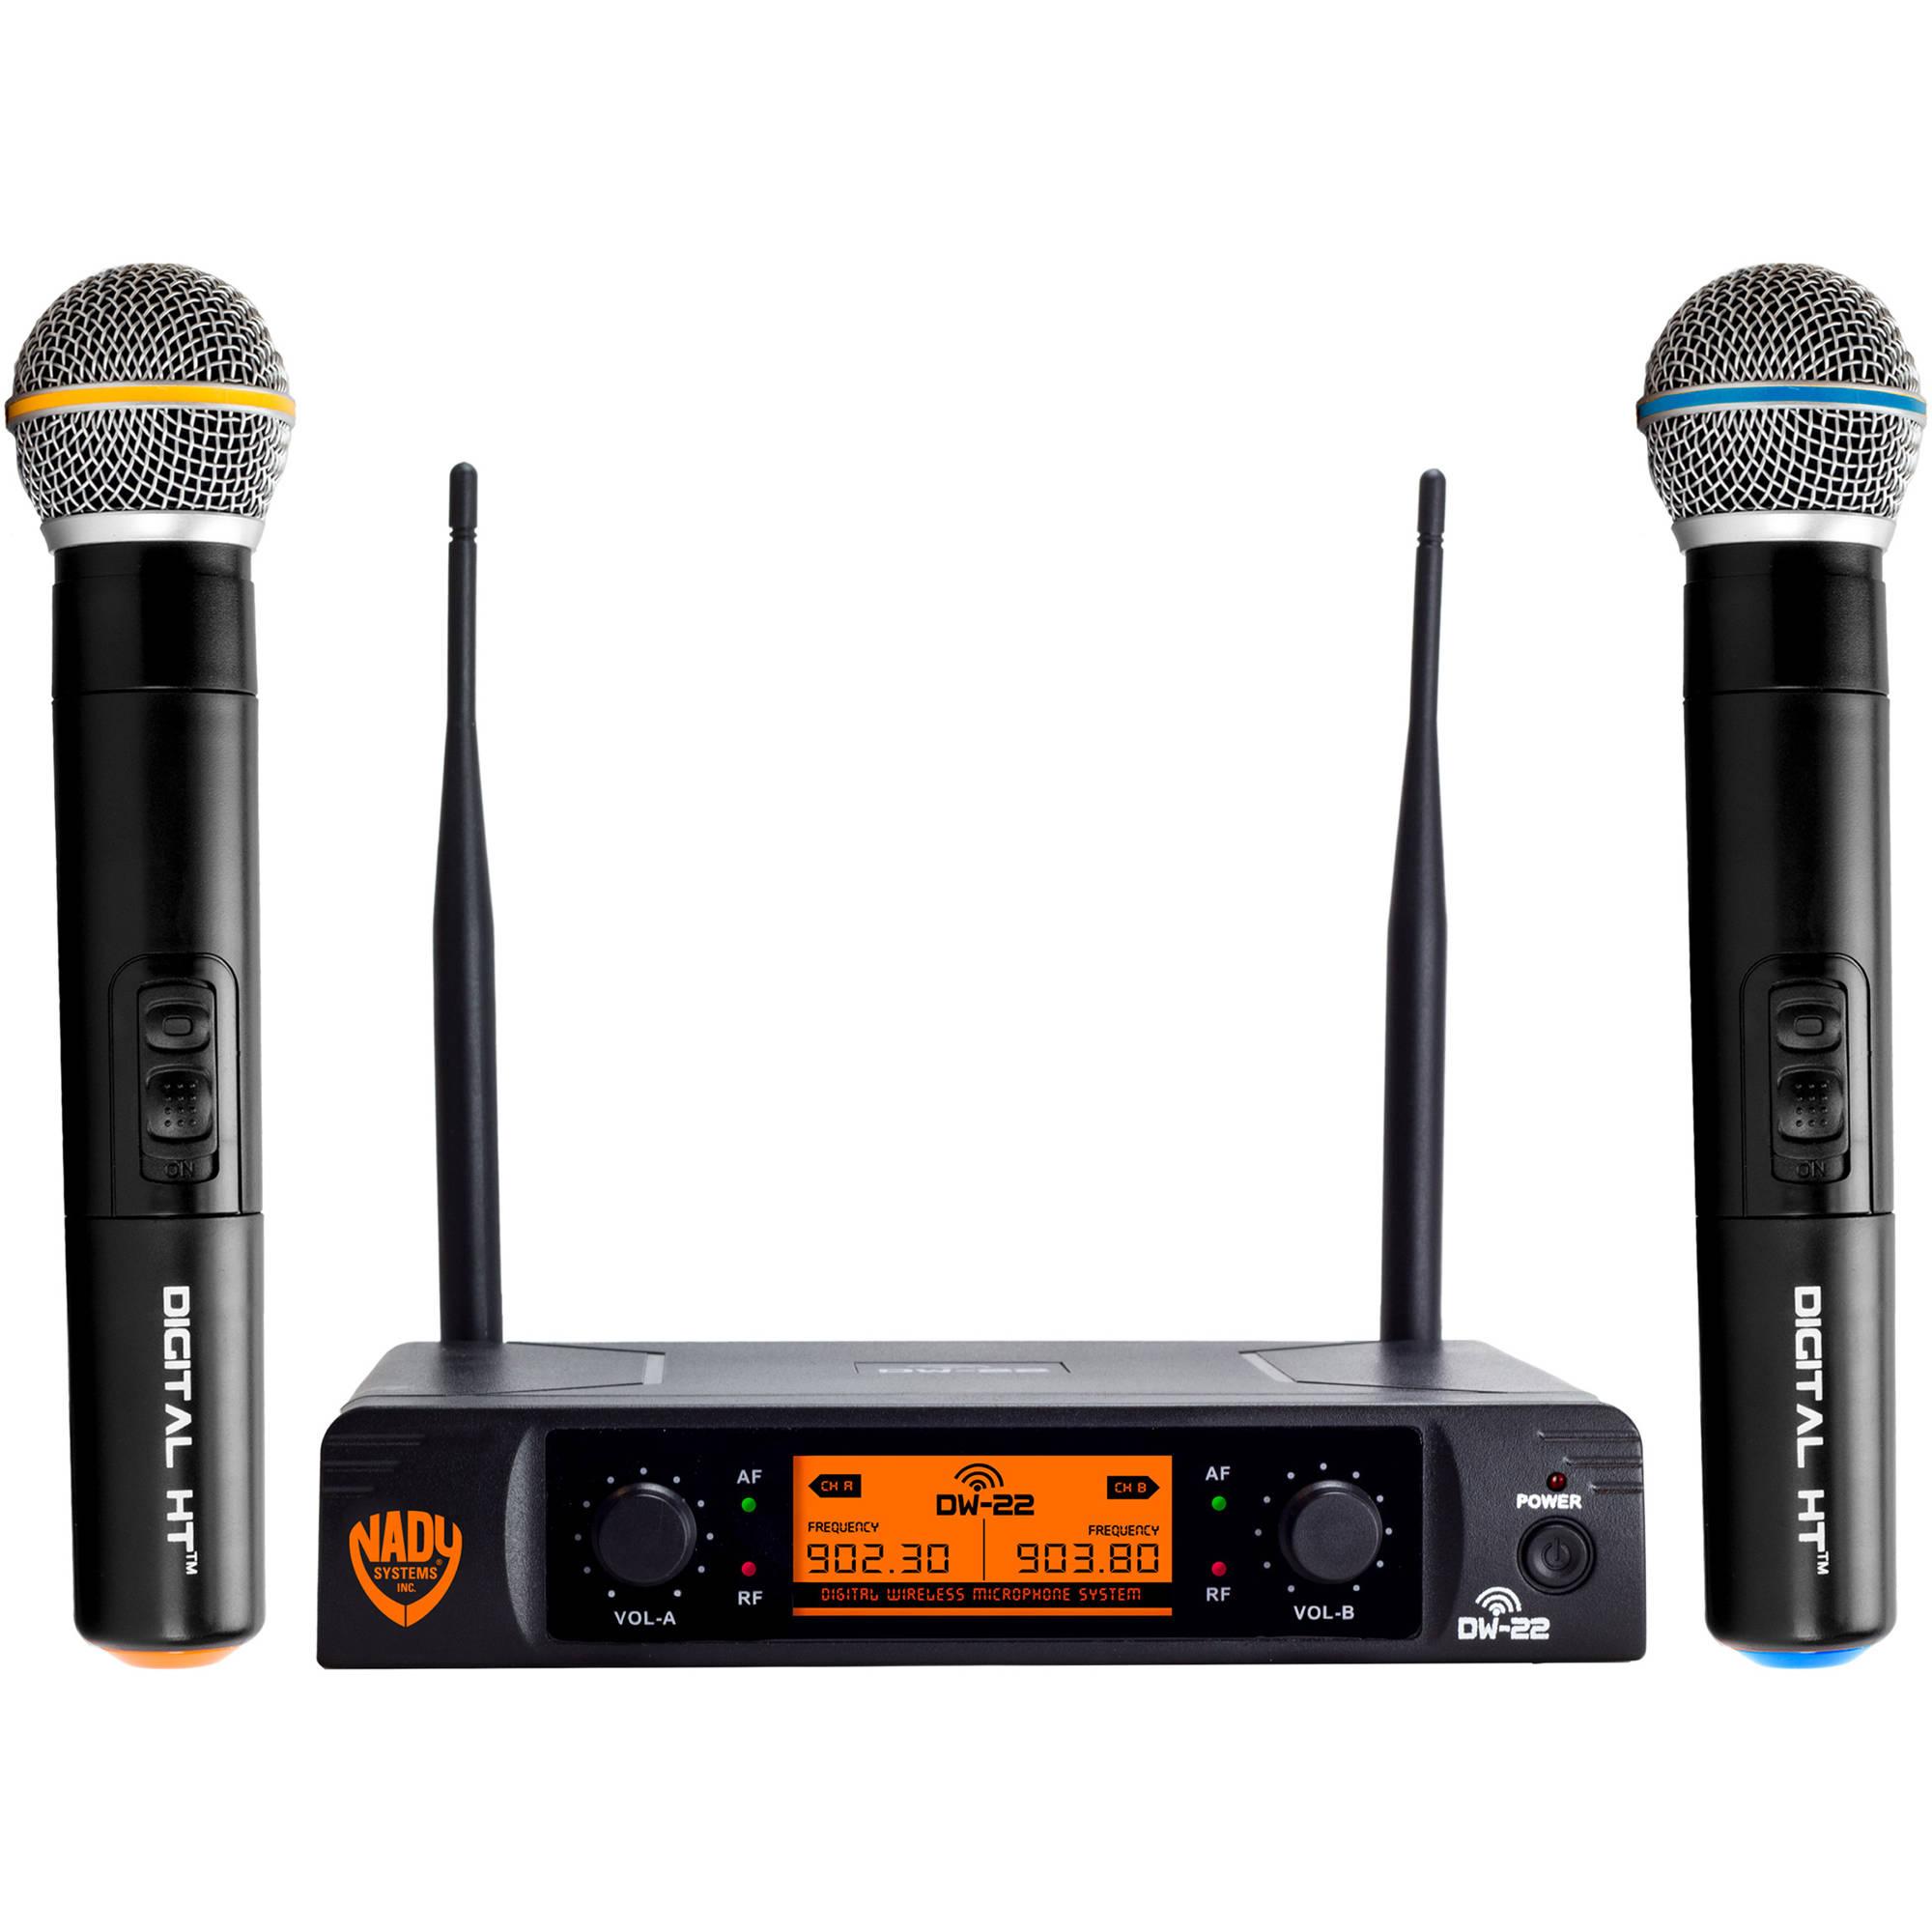 Nady Dual Wireless Handheld Microphone Package